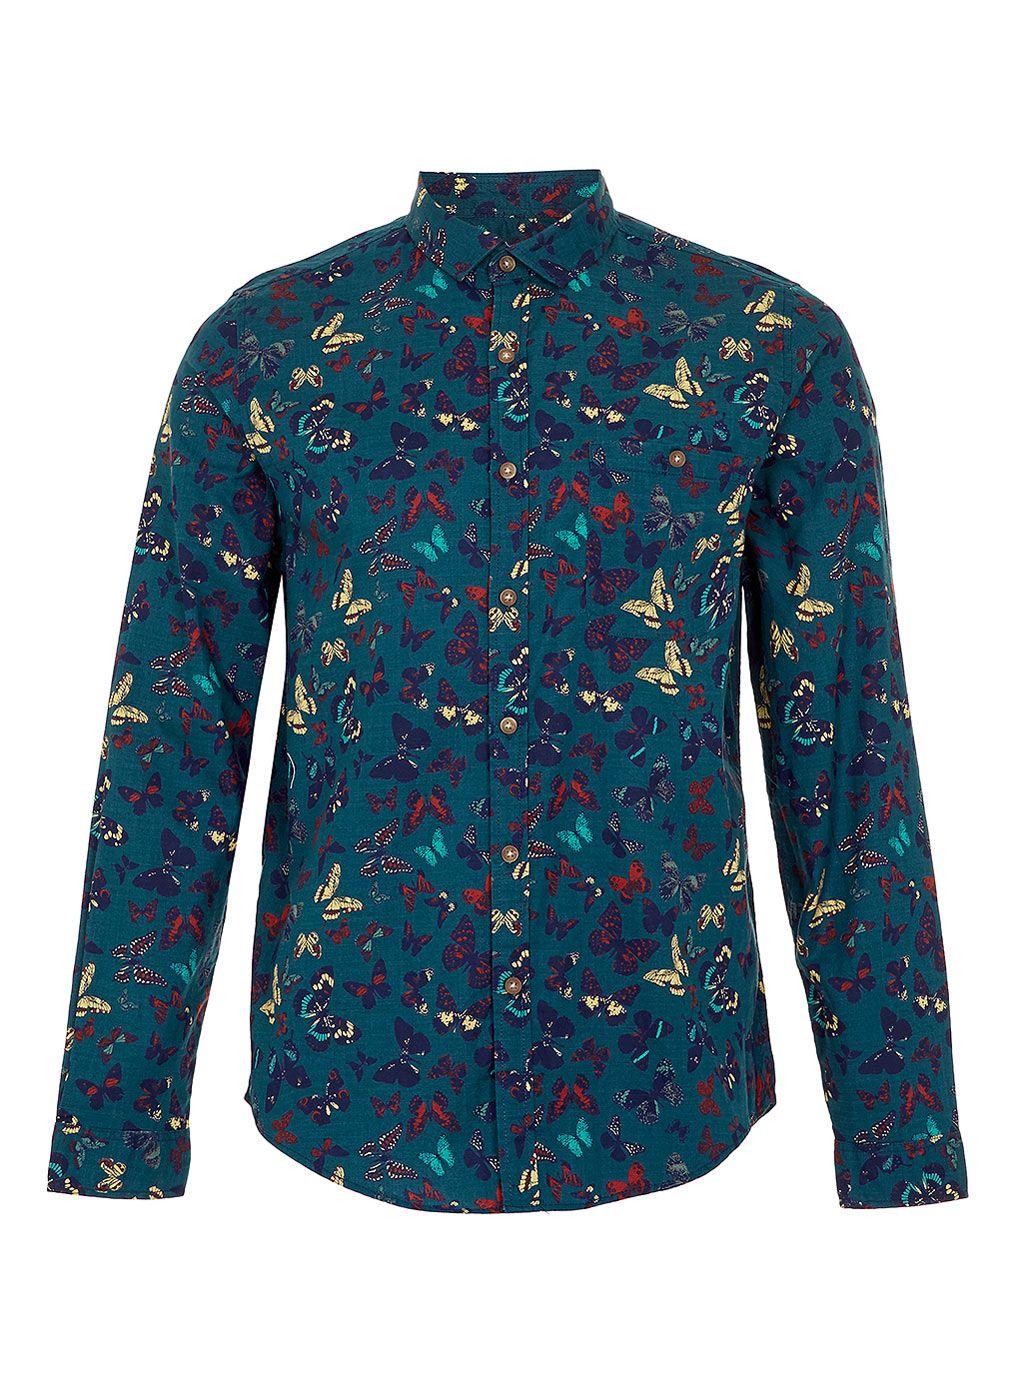 e93dfbf73 BLUE BUTTERFLY PRINT LONG SLEEVE SHIRT - Men's Shirts - Clothing - TOPMAN